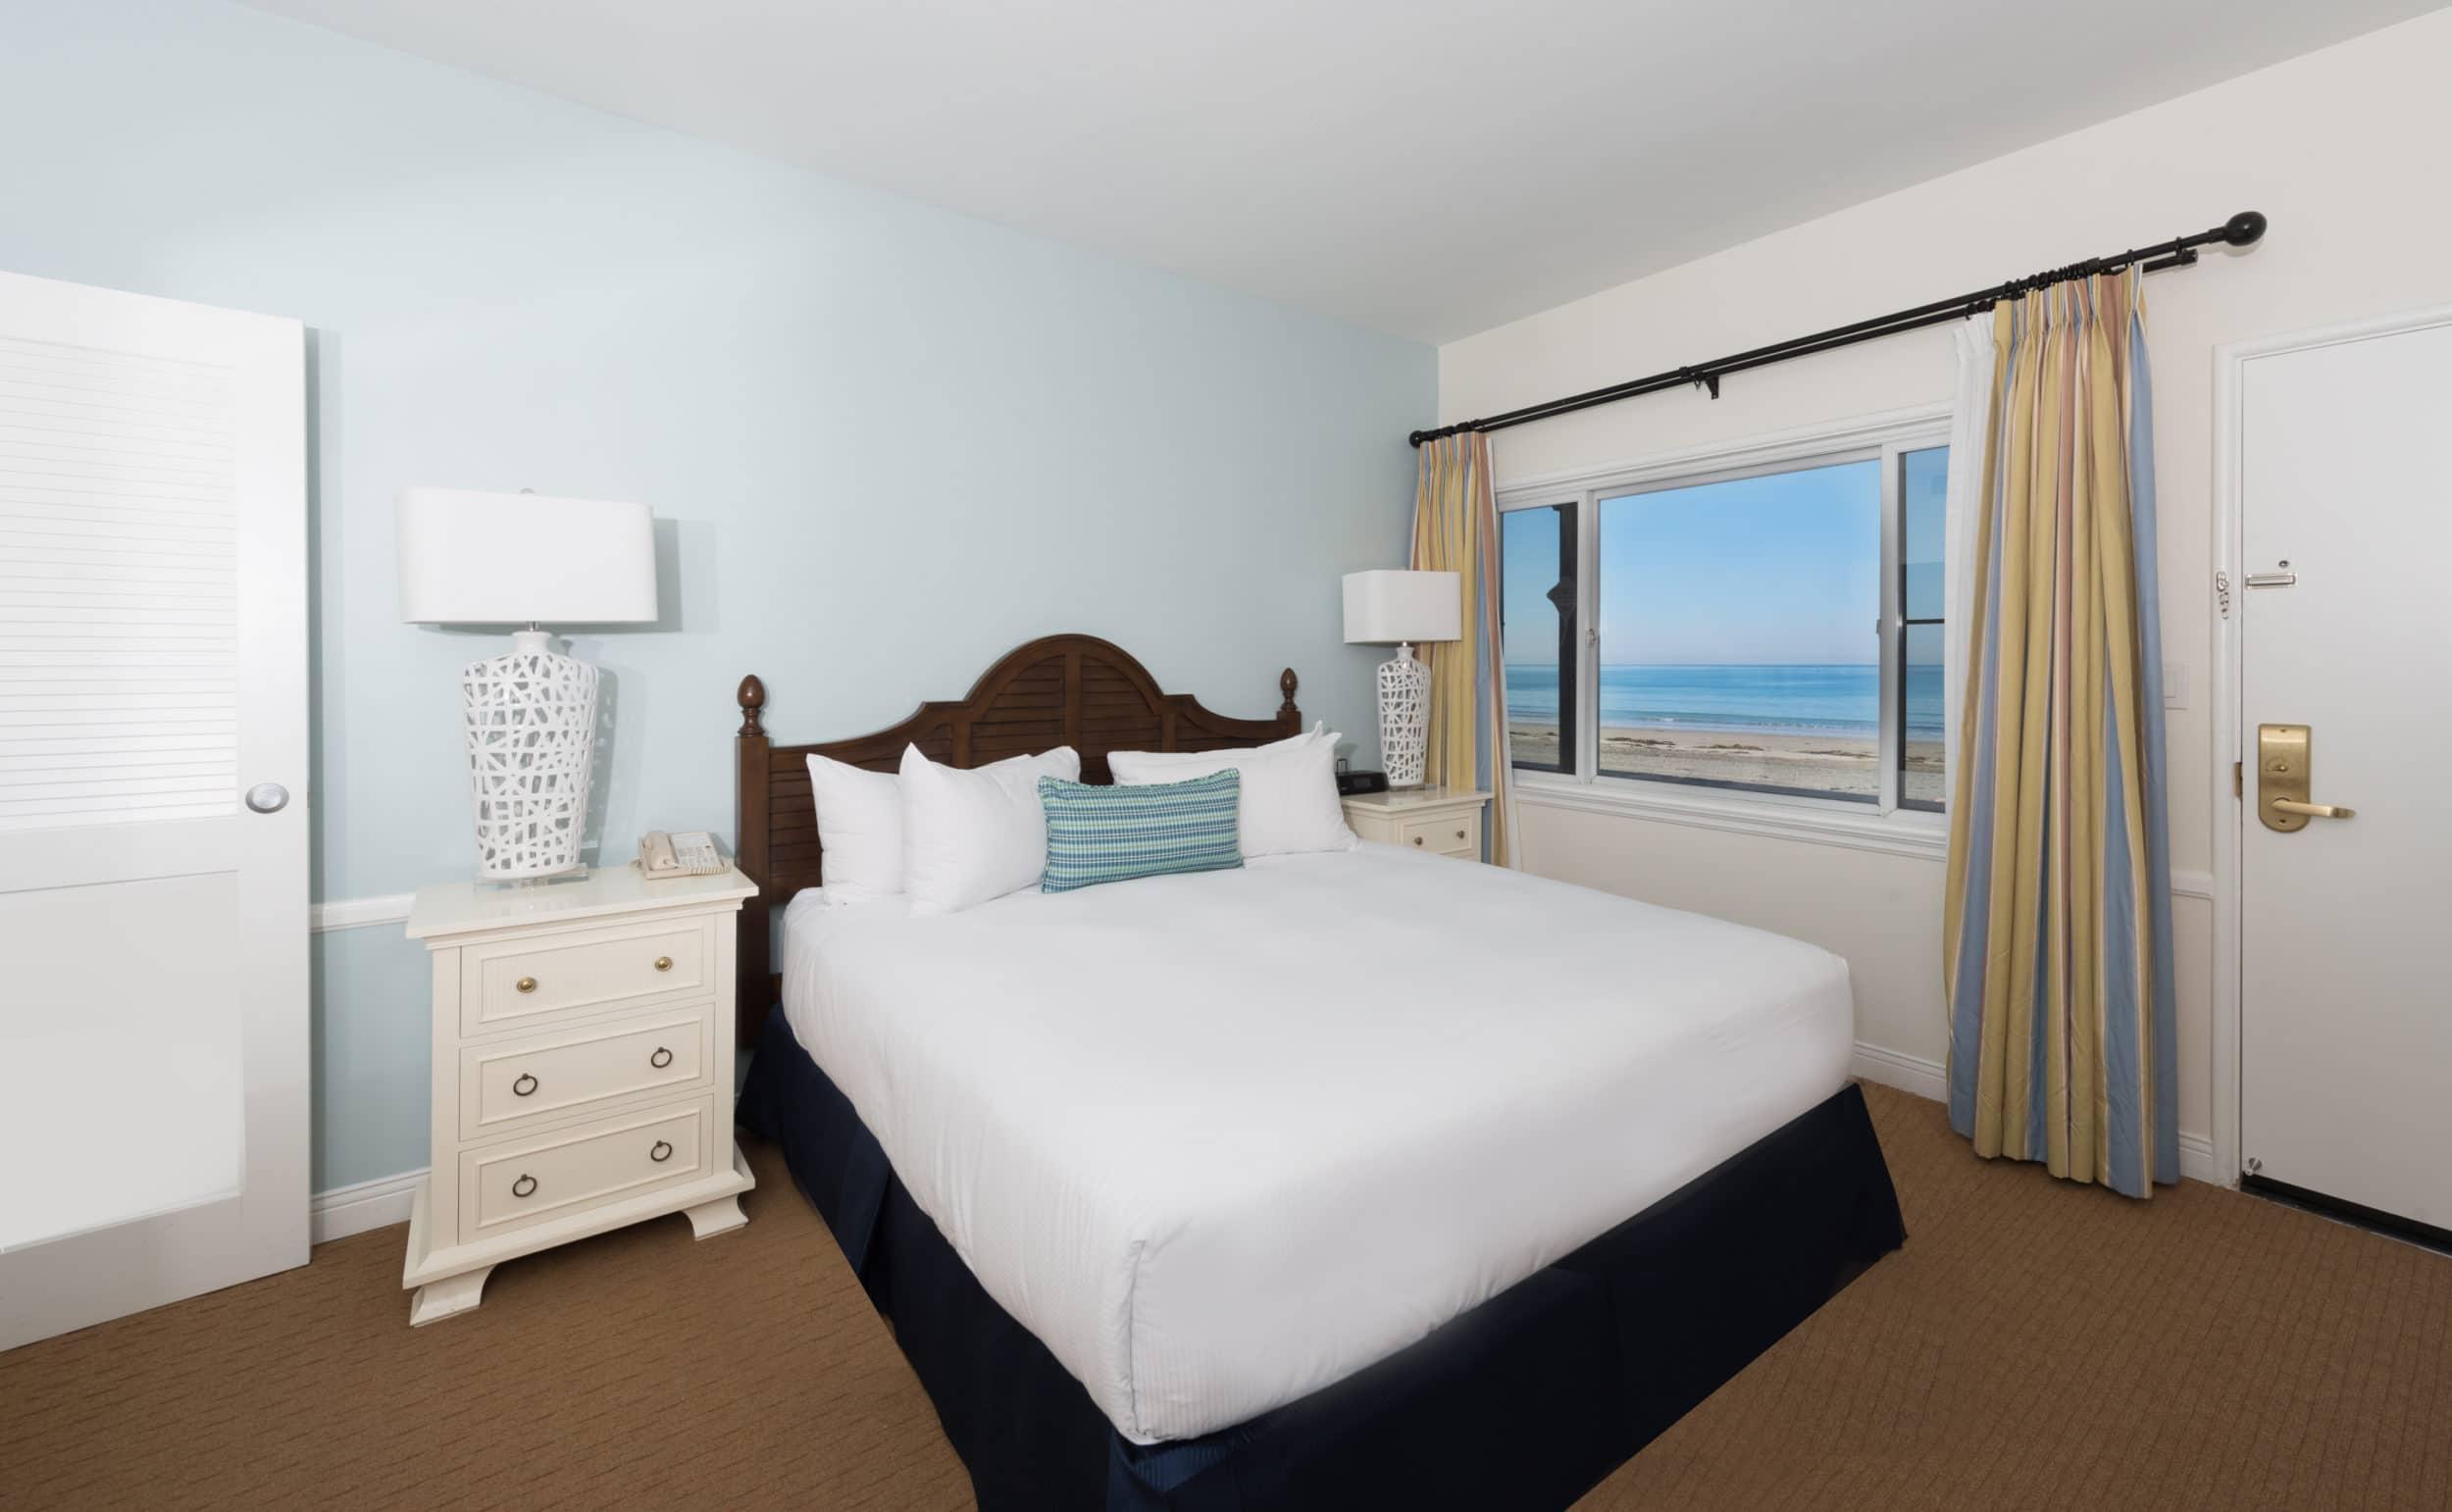 Guest bedroom interior in coastal colors at La Jolla Beach and Tennis Club